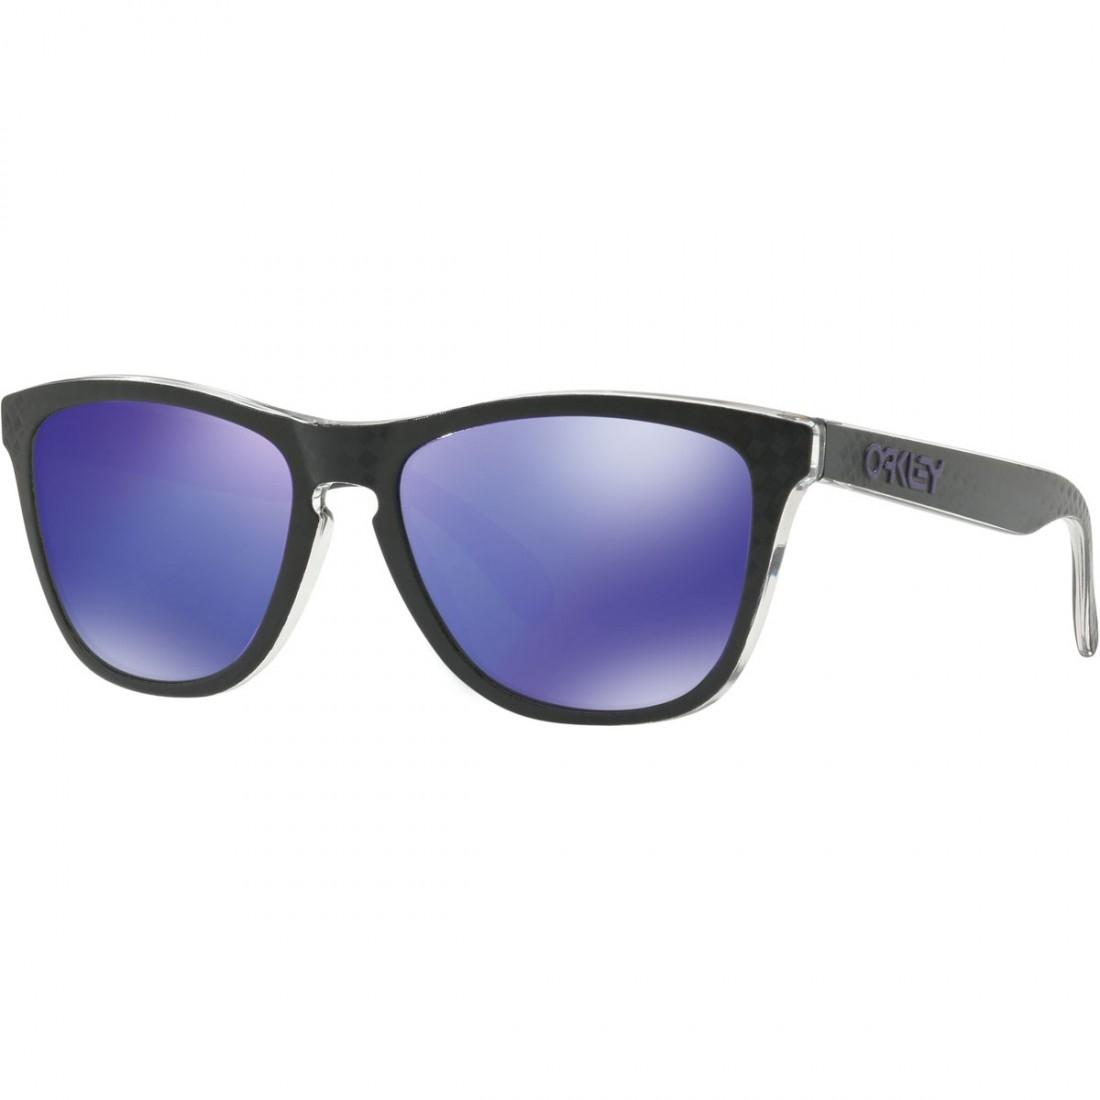 87ced3d7872 OAKLEY Frogskins Checkbox Collection Black   Violet Iridium Sun glasses ·  Motocard